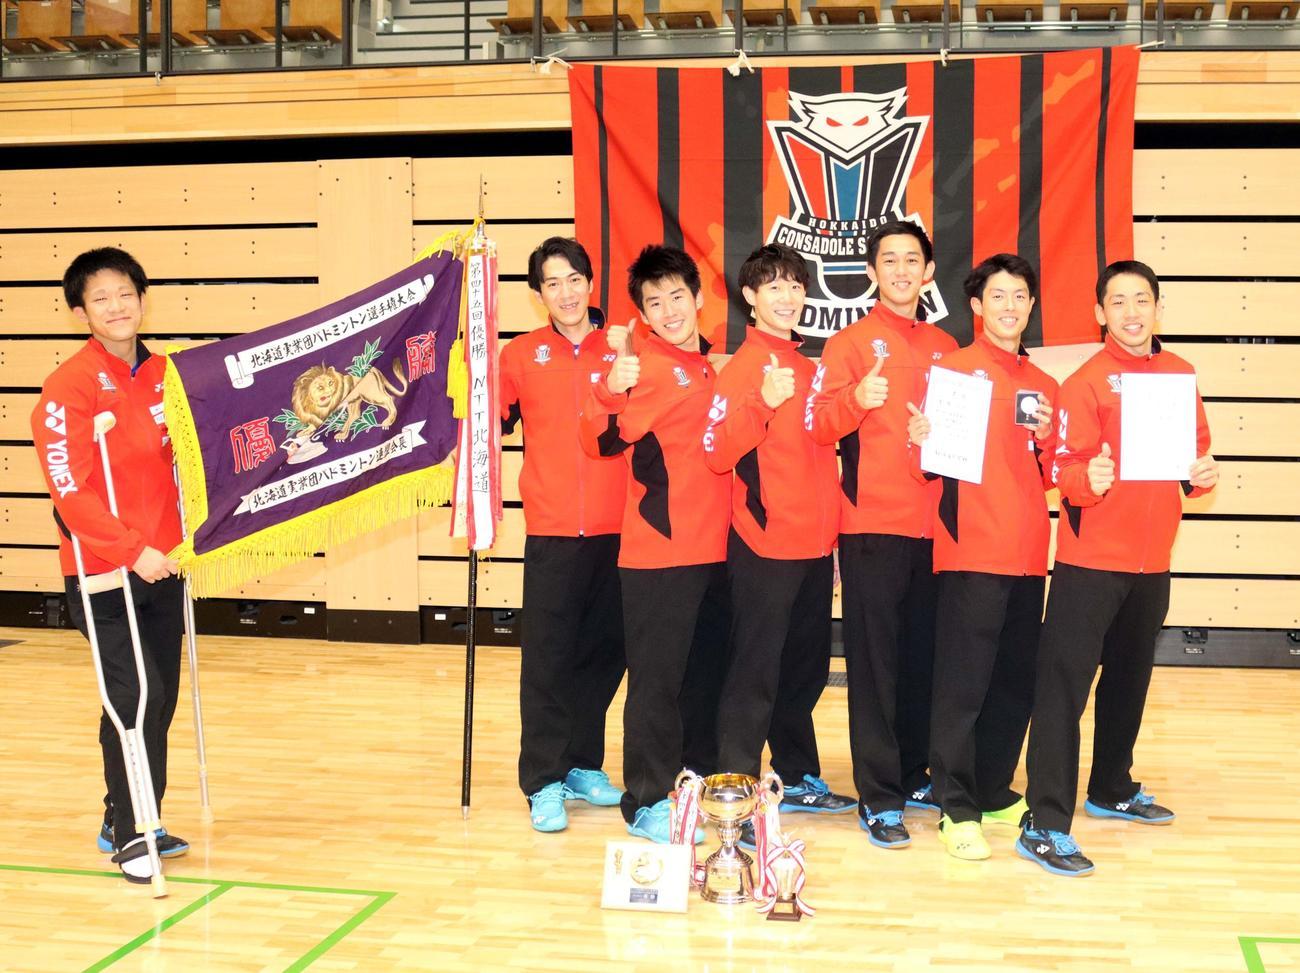 JR北海道を倒し初優勝したコンサドーレの(左から)渡辺、近藤、山沢、吉原、三浦、本田、大越(撮影・永野高輔)